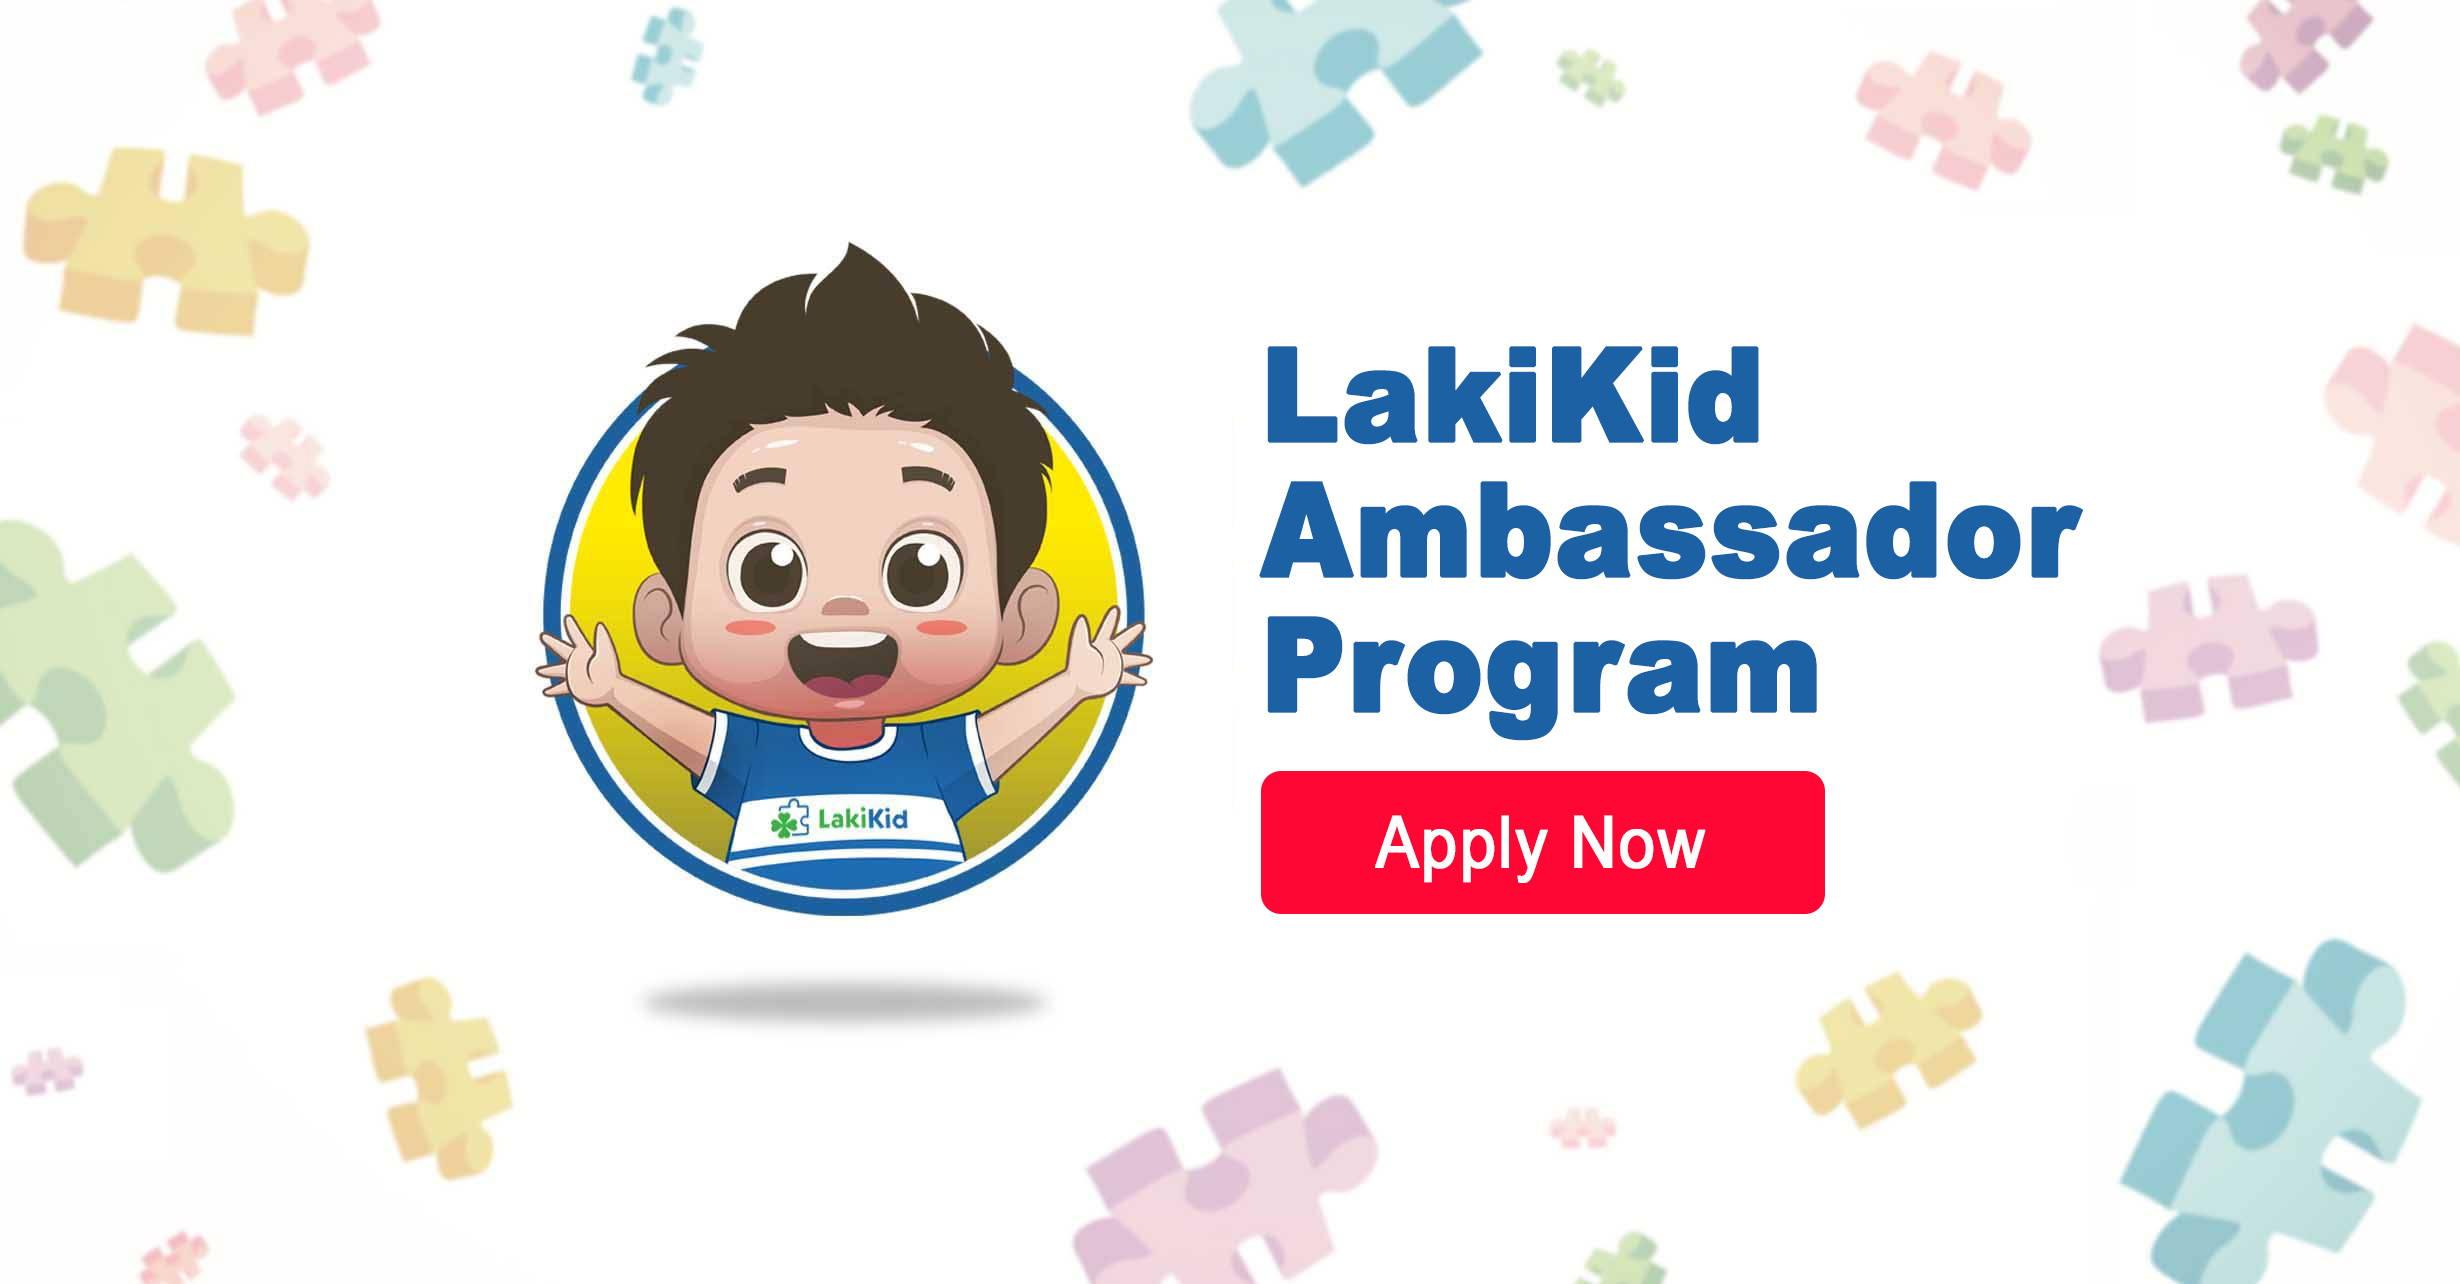 LakiKid Ambassador Program